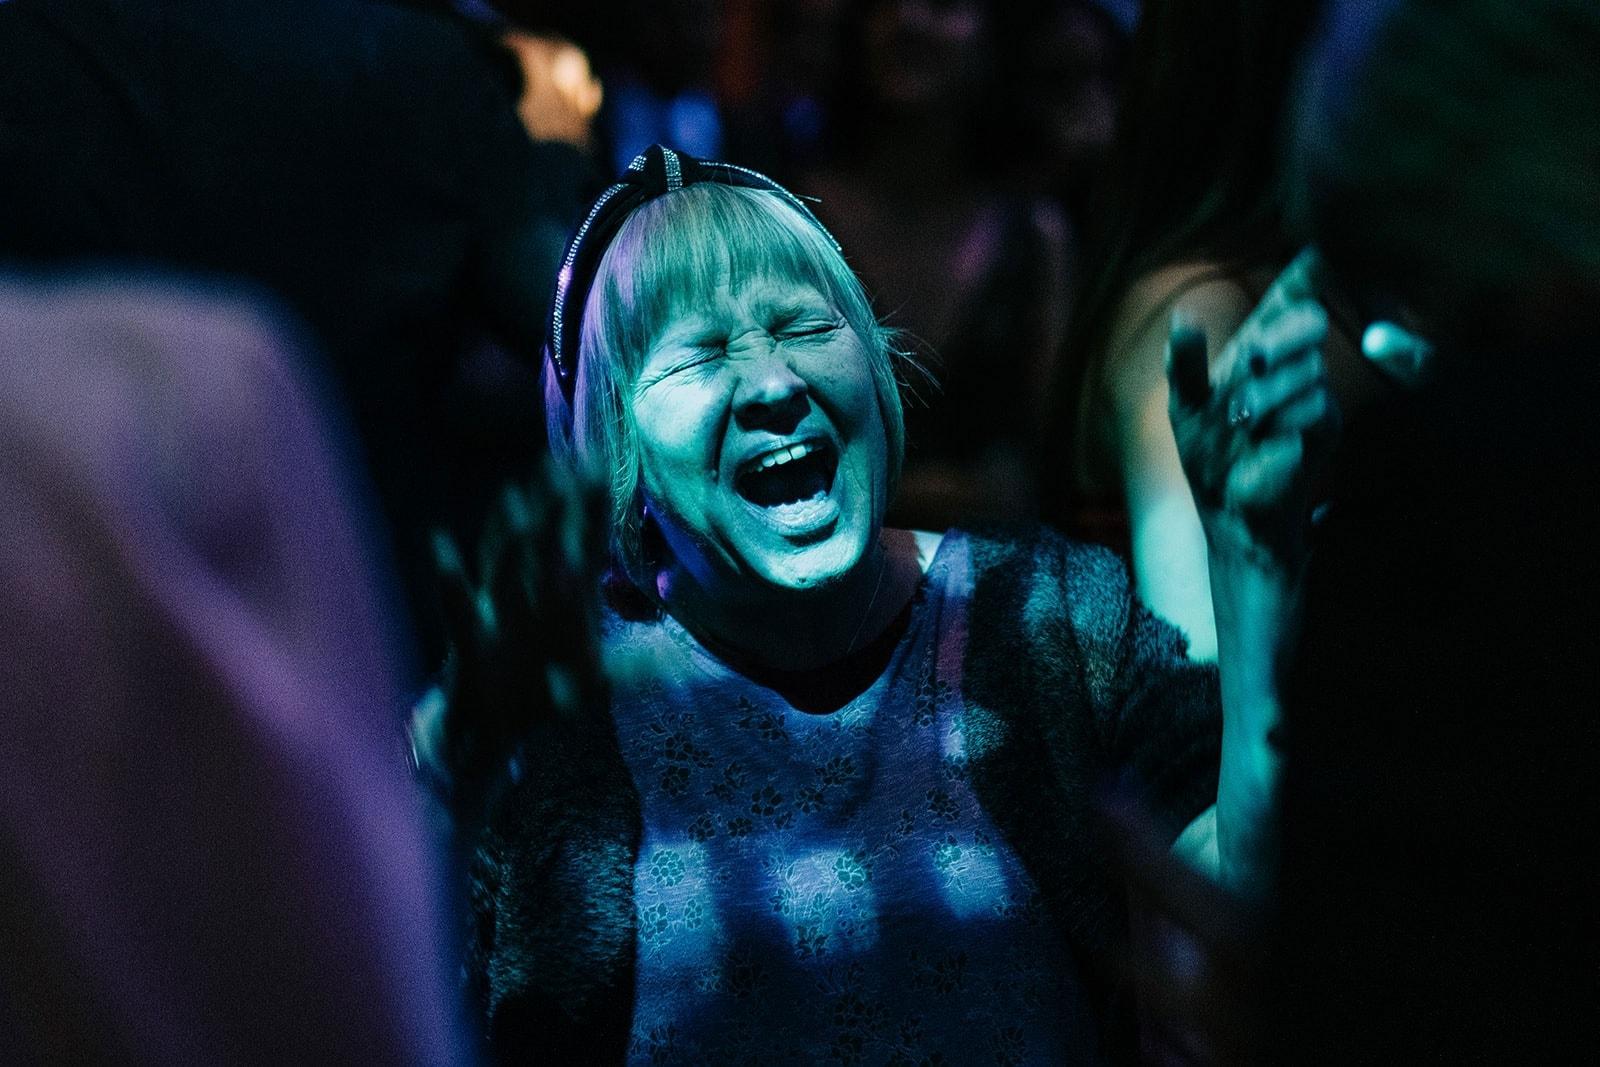 Louise's aunt parties on the dance floor